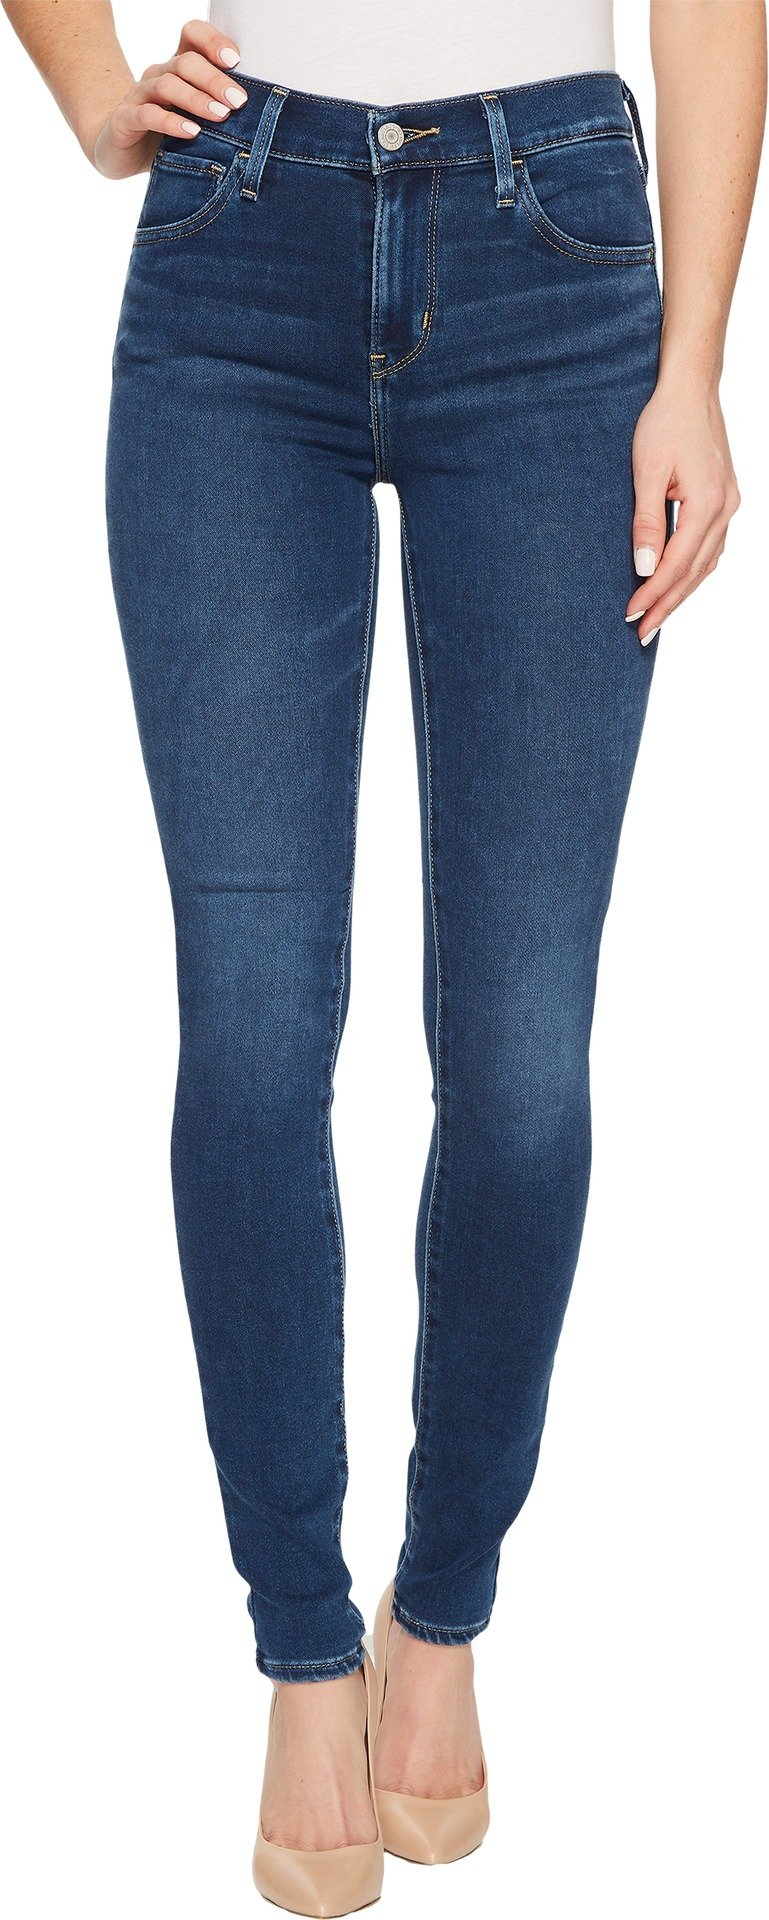 Levi's Women's 720 High Rise Super Skinny Jeans, Blue Me Away, 27 (US 4) R